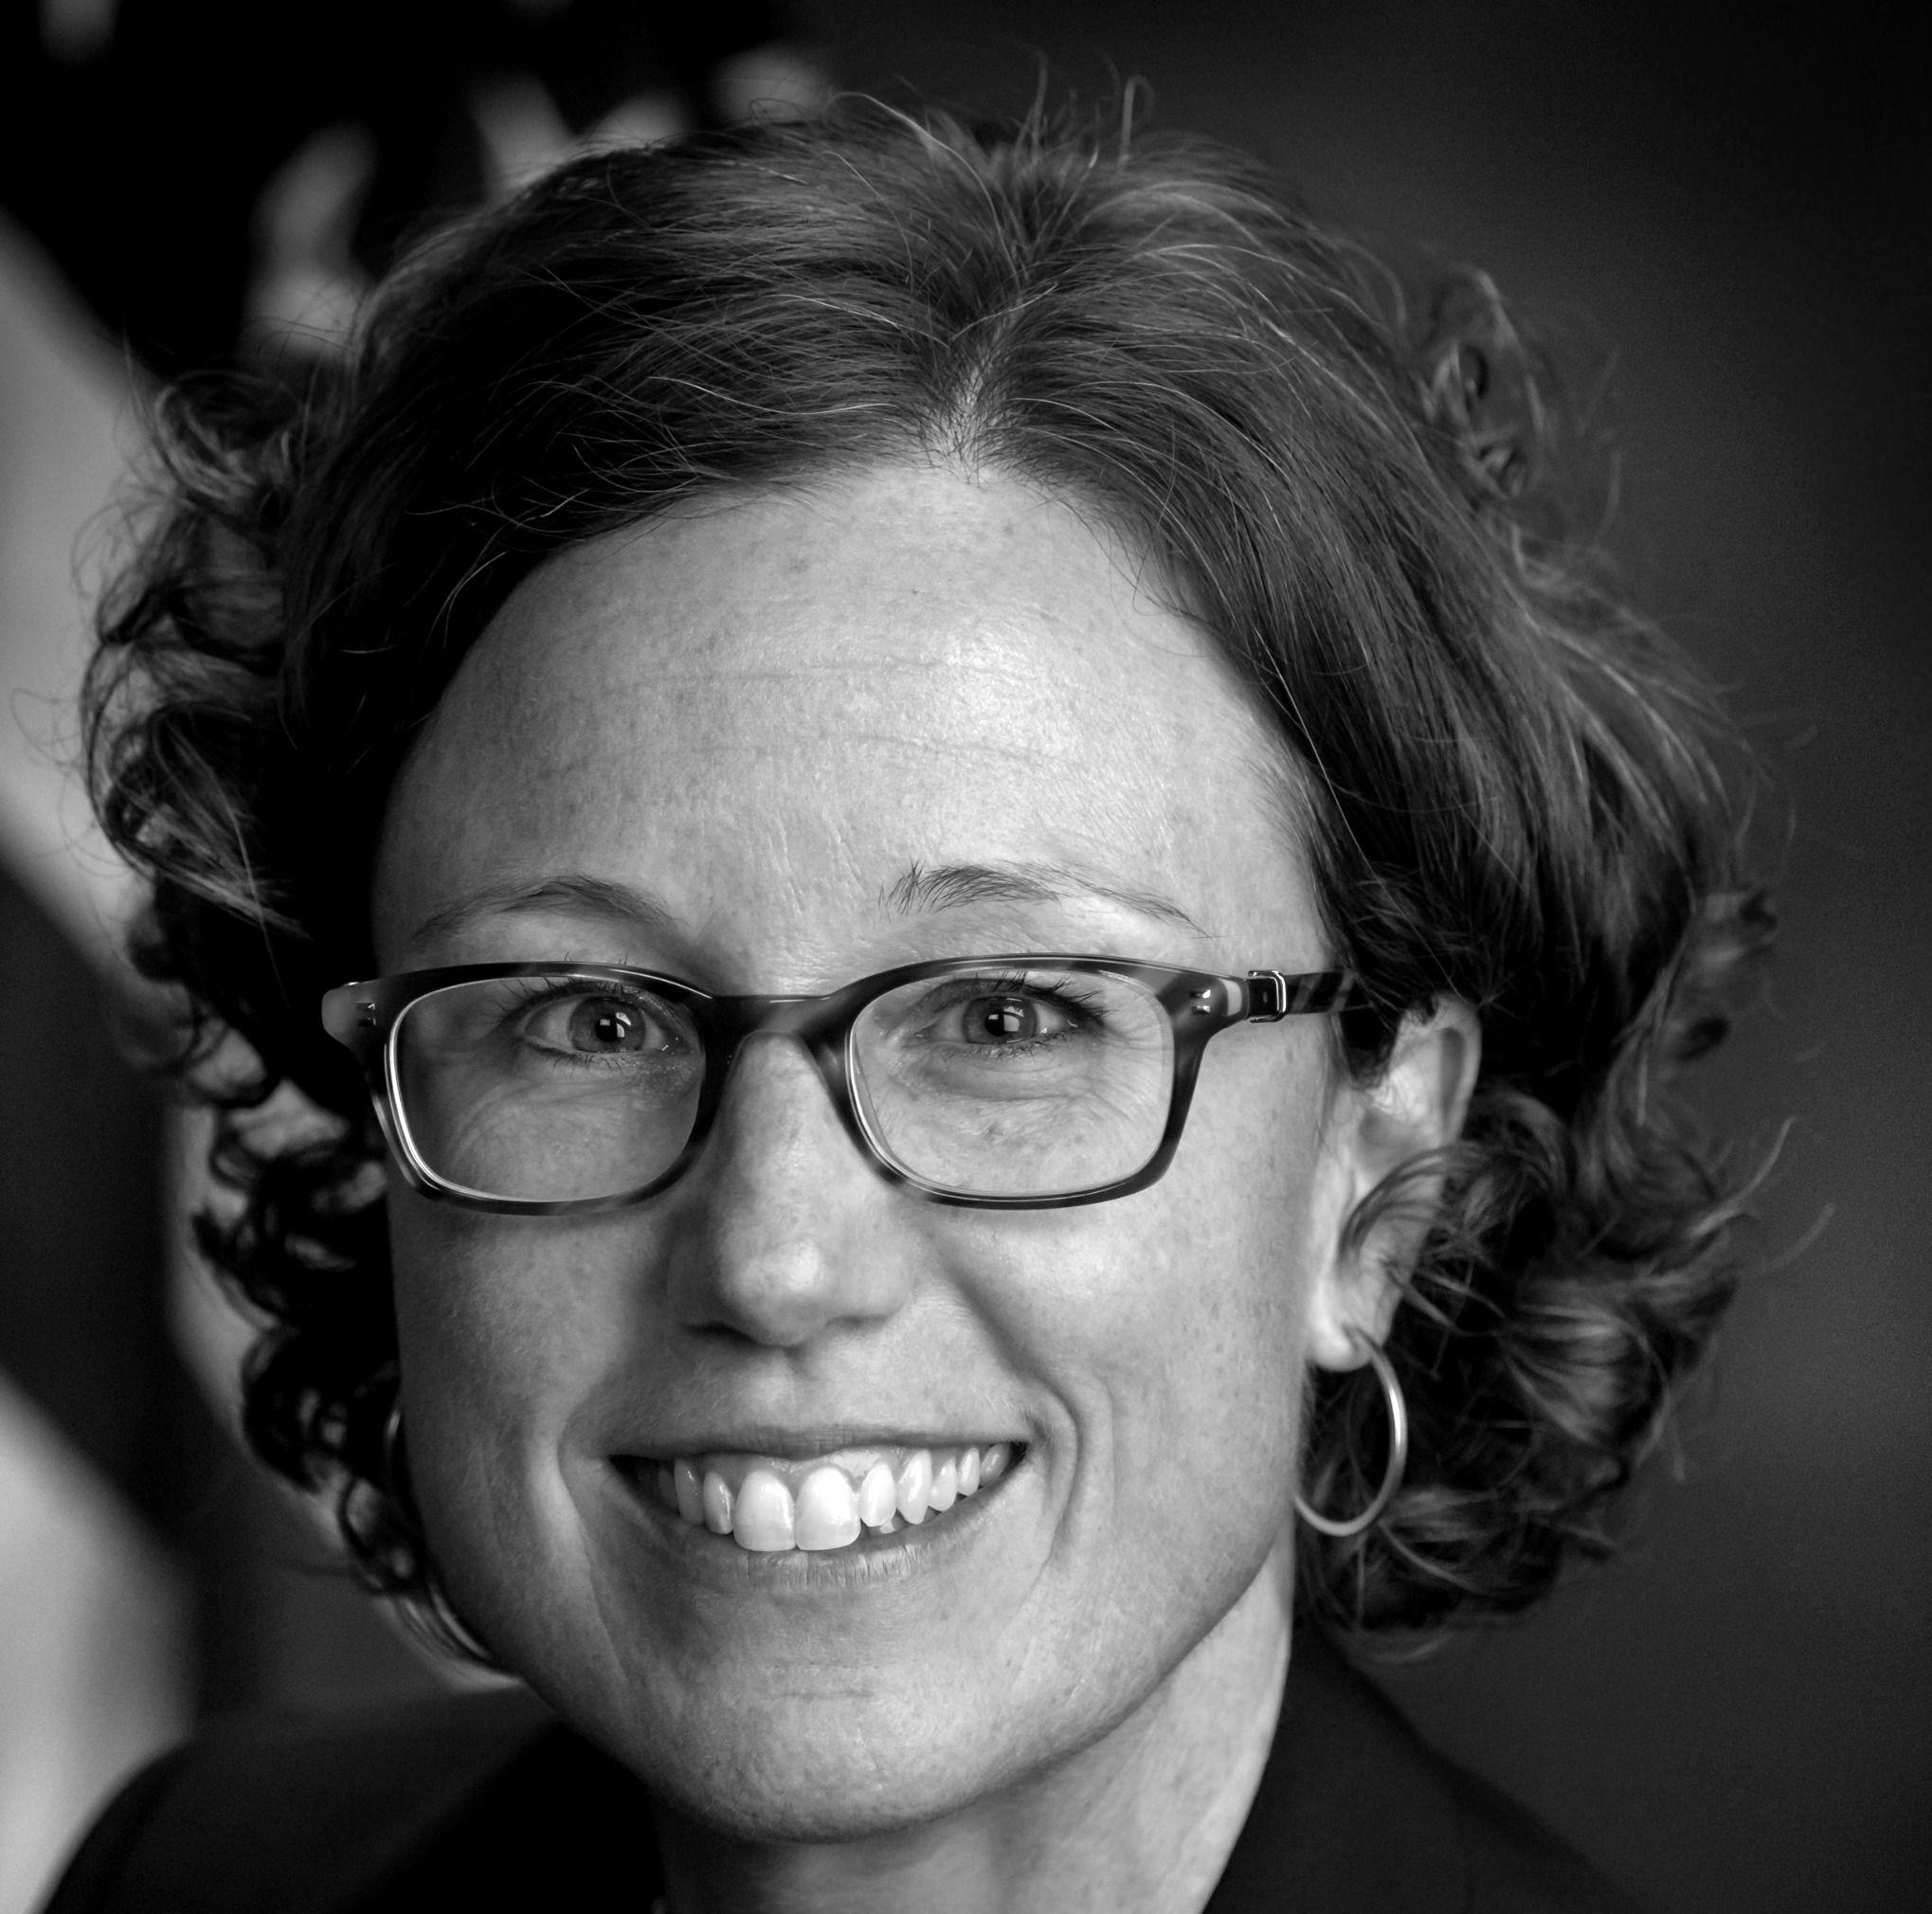 Kathy O'Neill